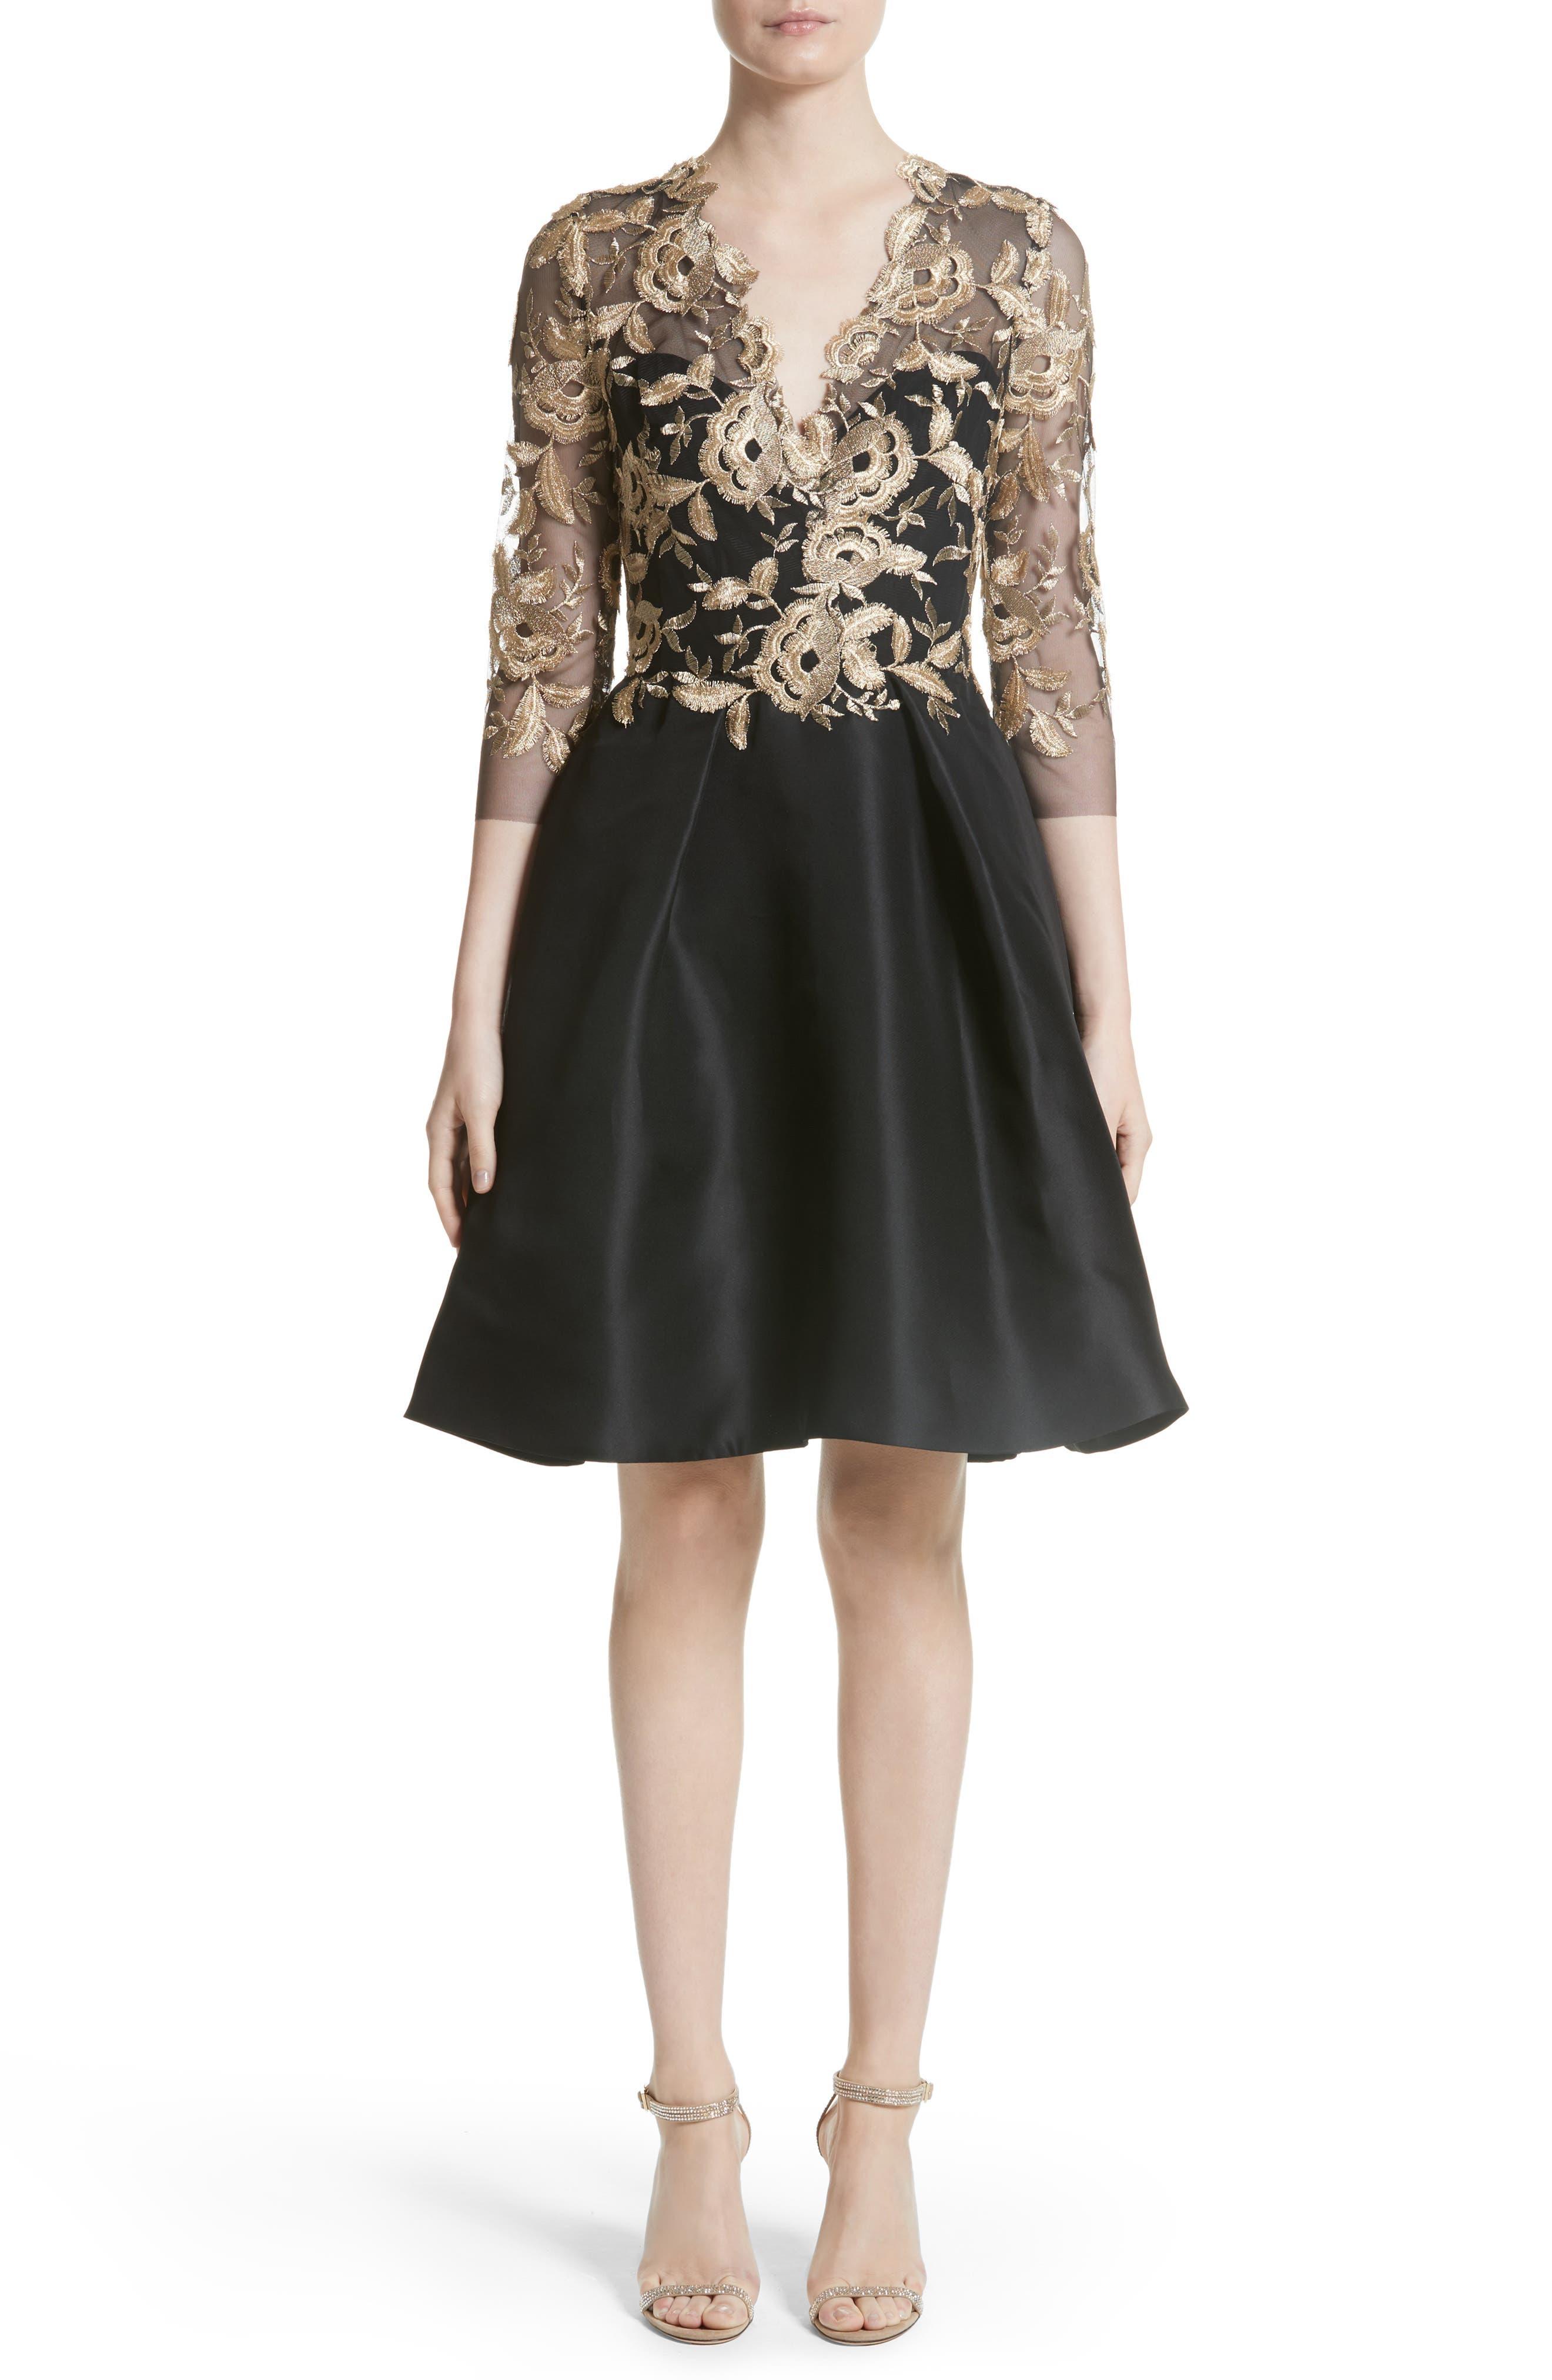 Alternate Image 1 Selected - Monique Lhuillier Embroidered Gazar Fit & Flare Dress